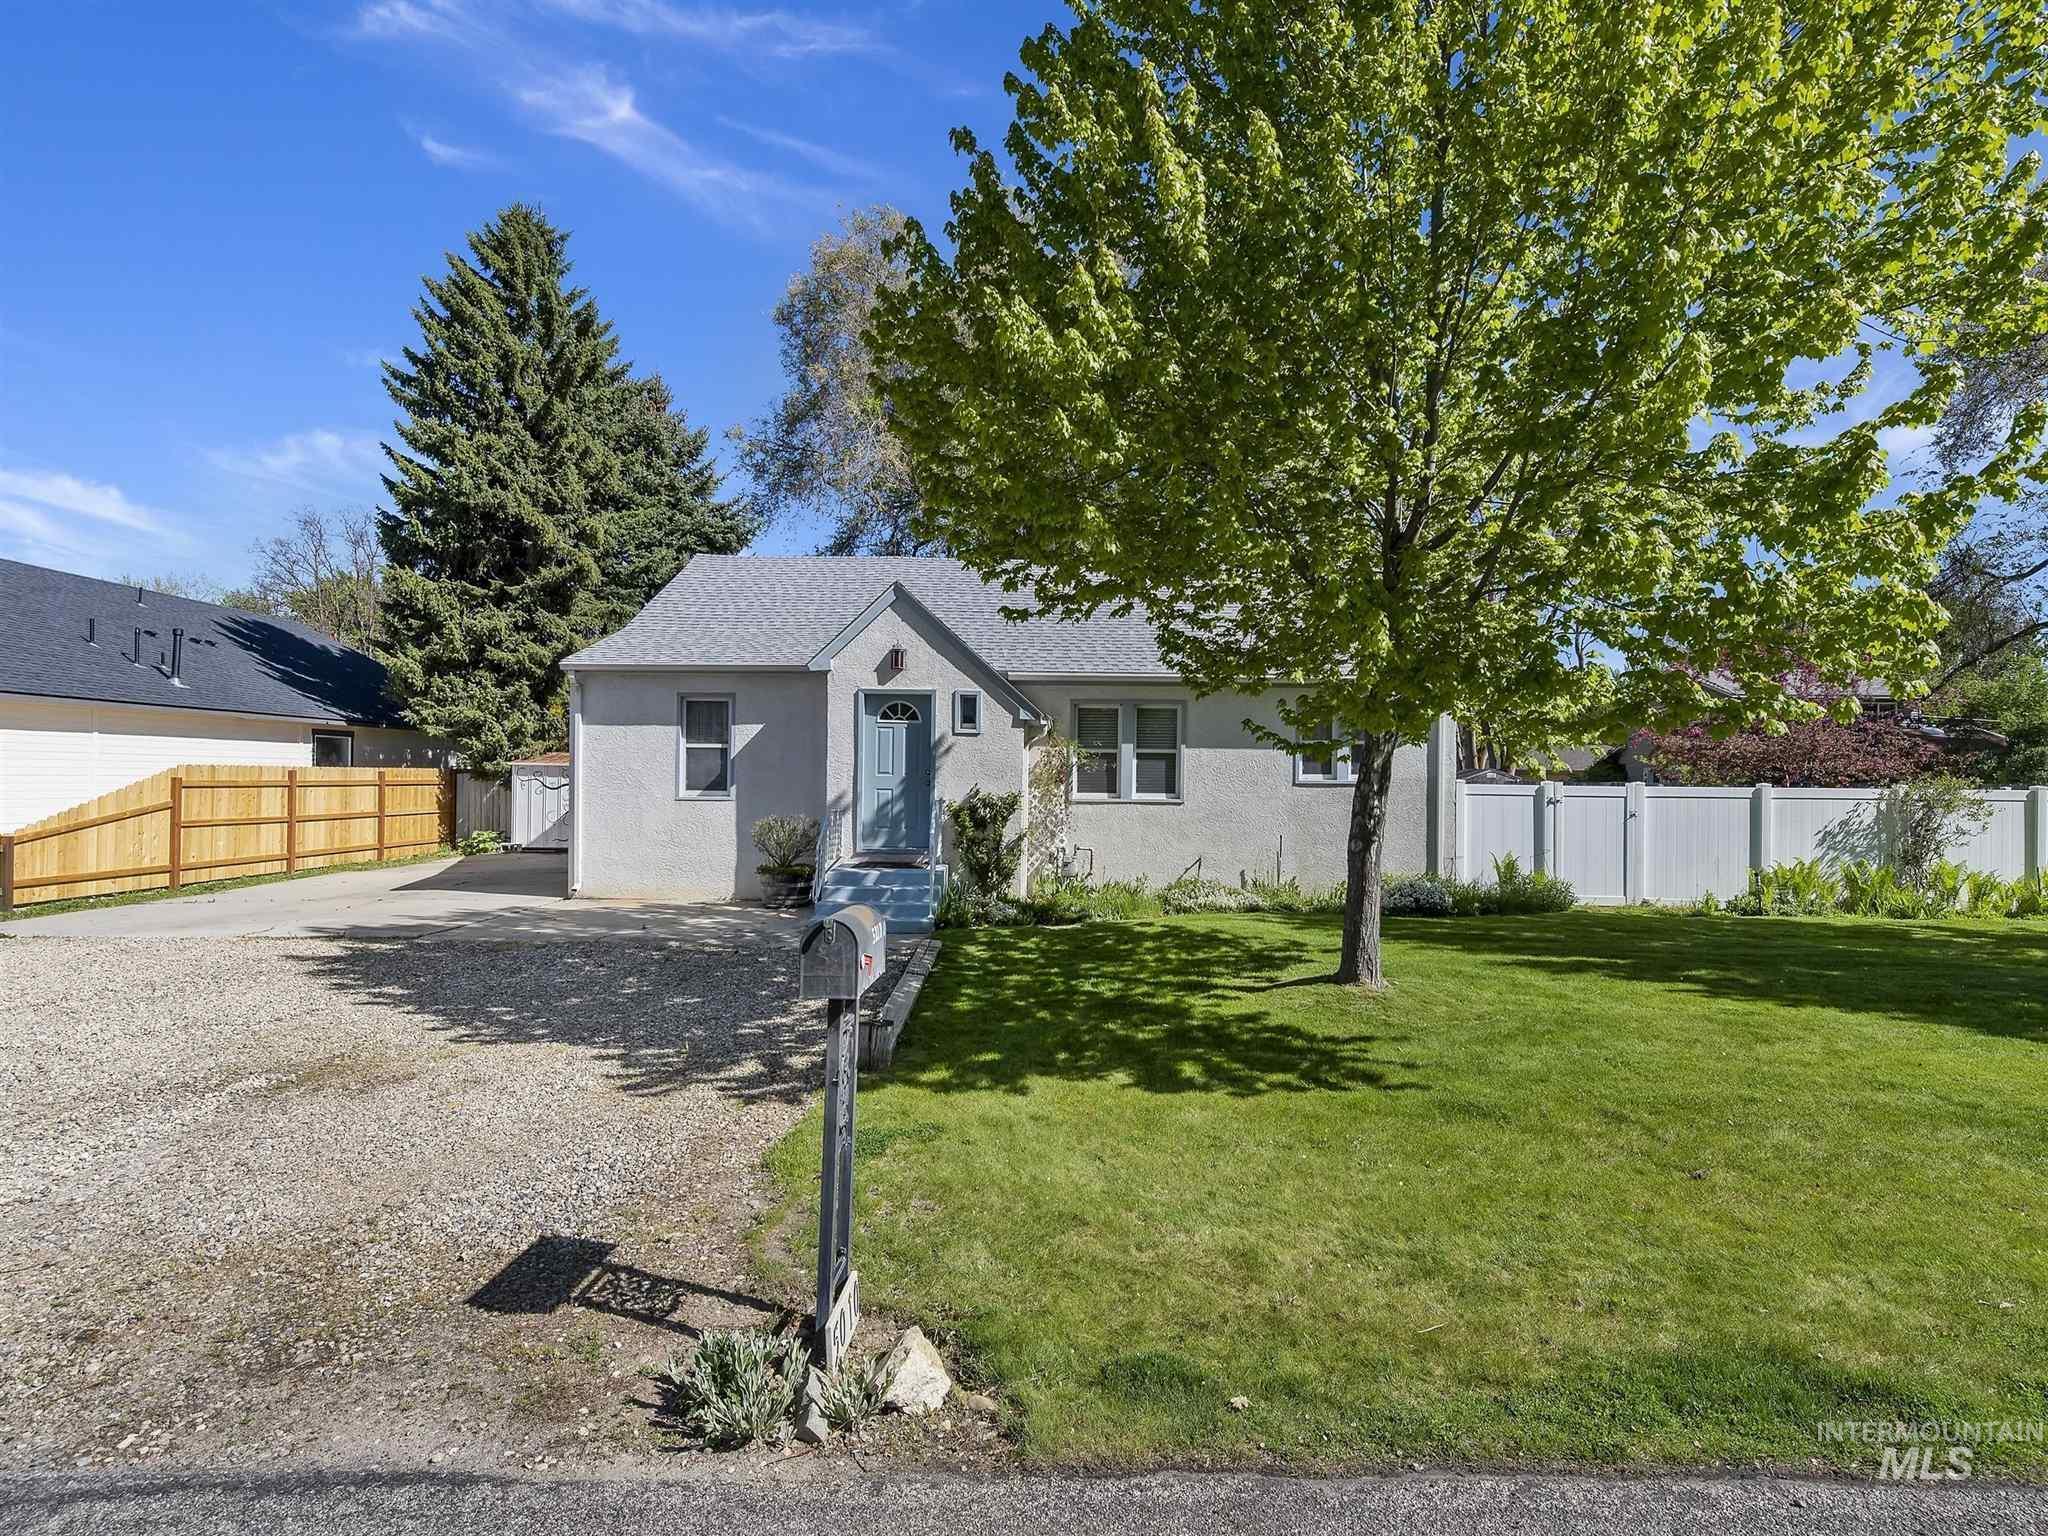 5010 W Alamosa Property Photo - Boise, ID real estate listing